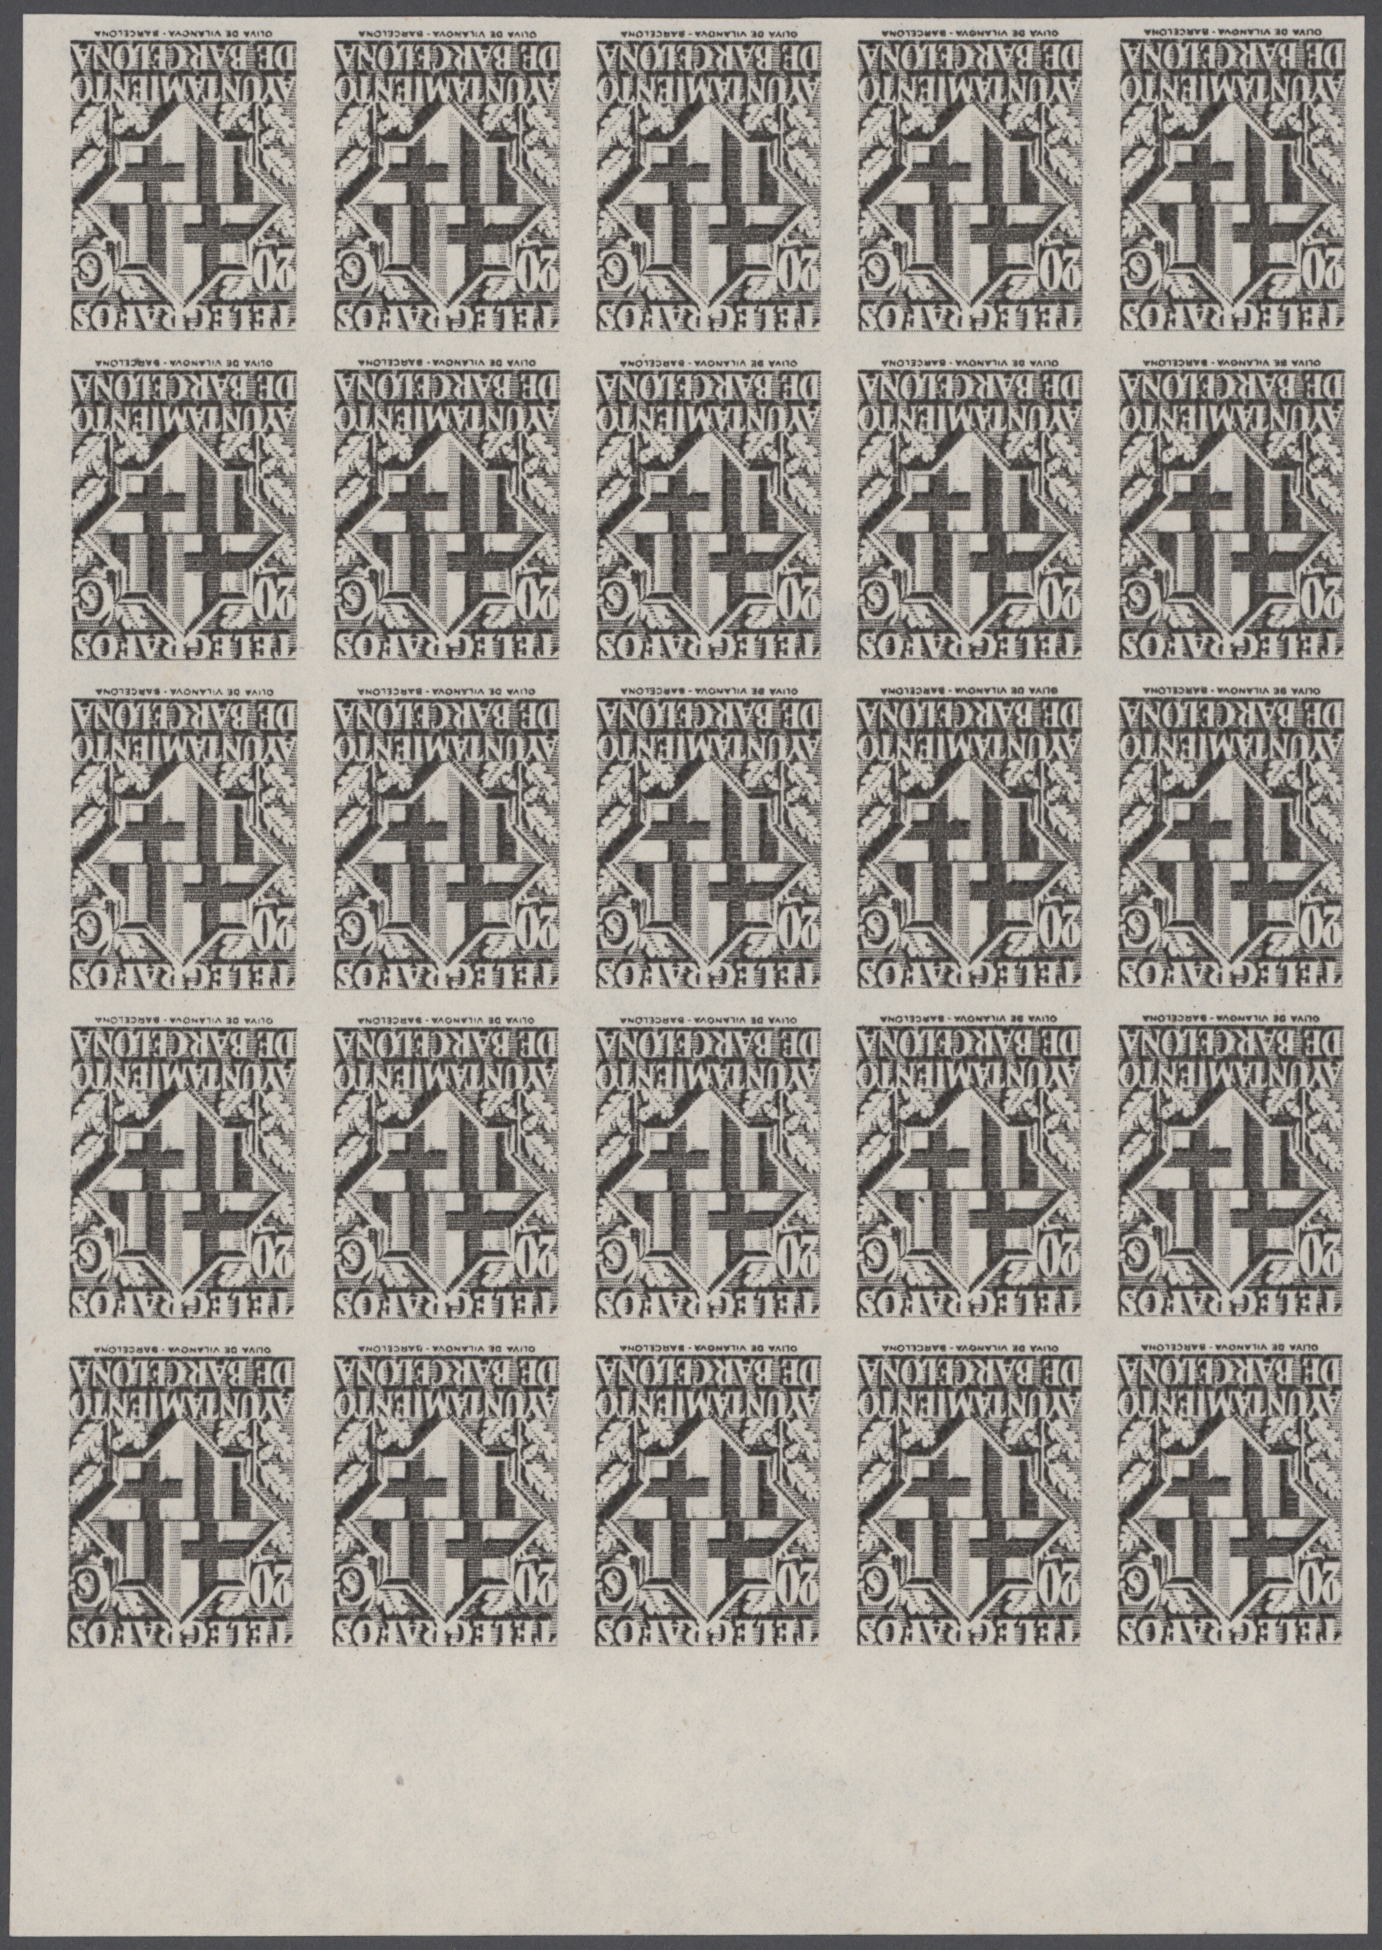 Lot 27322 - nachlässe  -  Auktionshaus Christoph Gärtner GmbH & Co. KG Sale #46 Gollcetions Germany - including the suplement